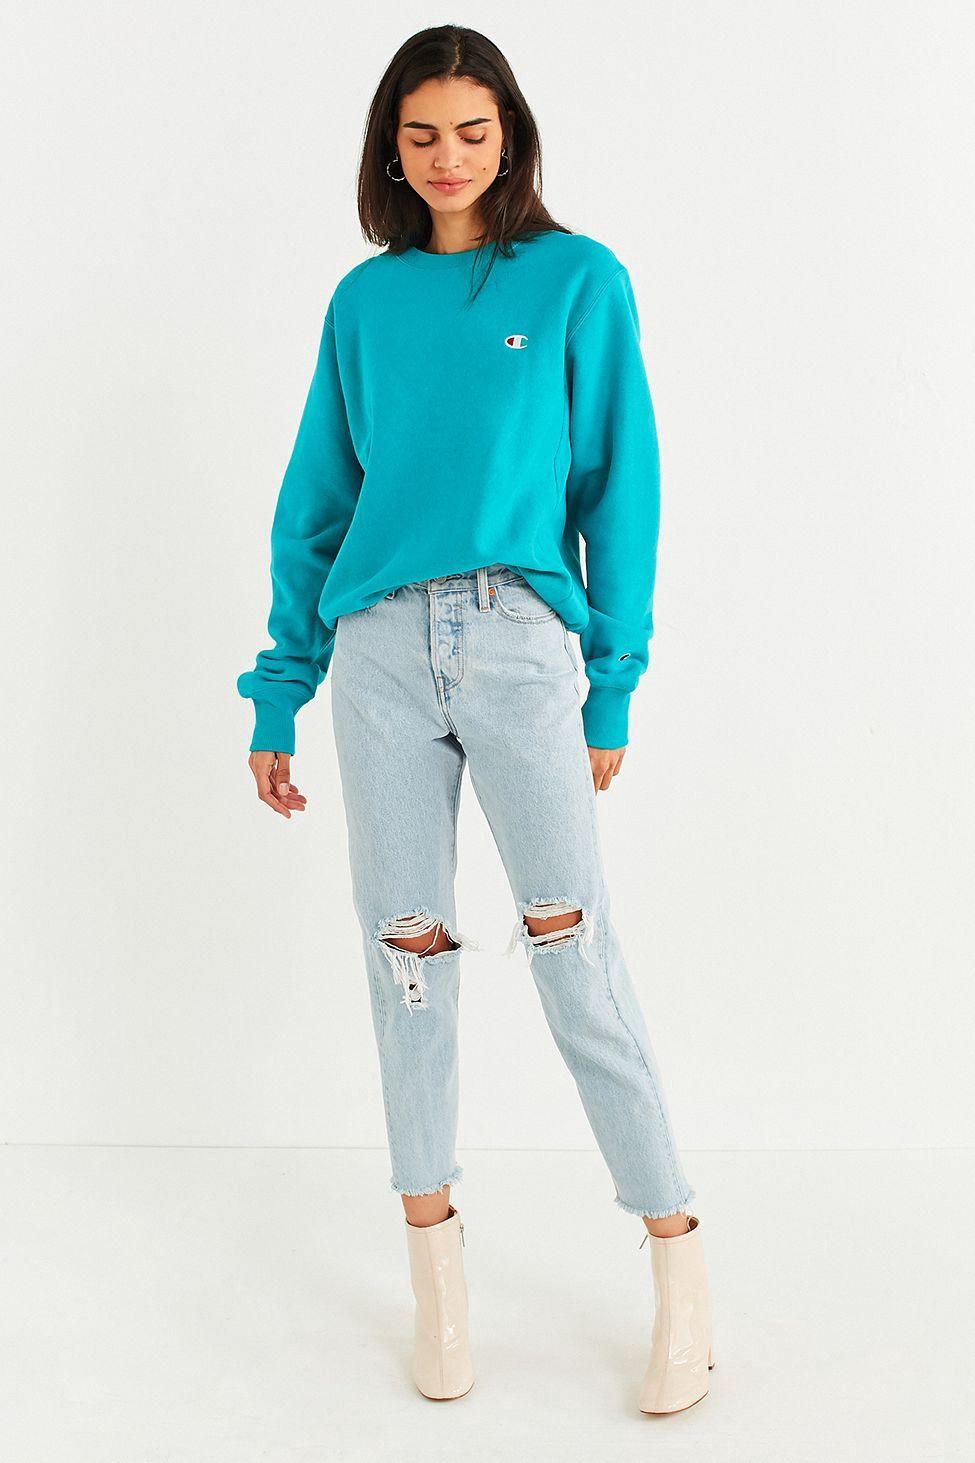 Urban Outfitters Champion Uo Reverse Weave Logo Pullover Sweatshirt Turquoise Sweatshirts Vintage Retro Clothing Sweatshirt Fashion [ 1463 x 975 Pixel ]